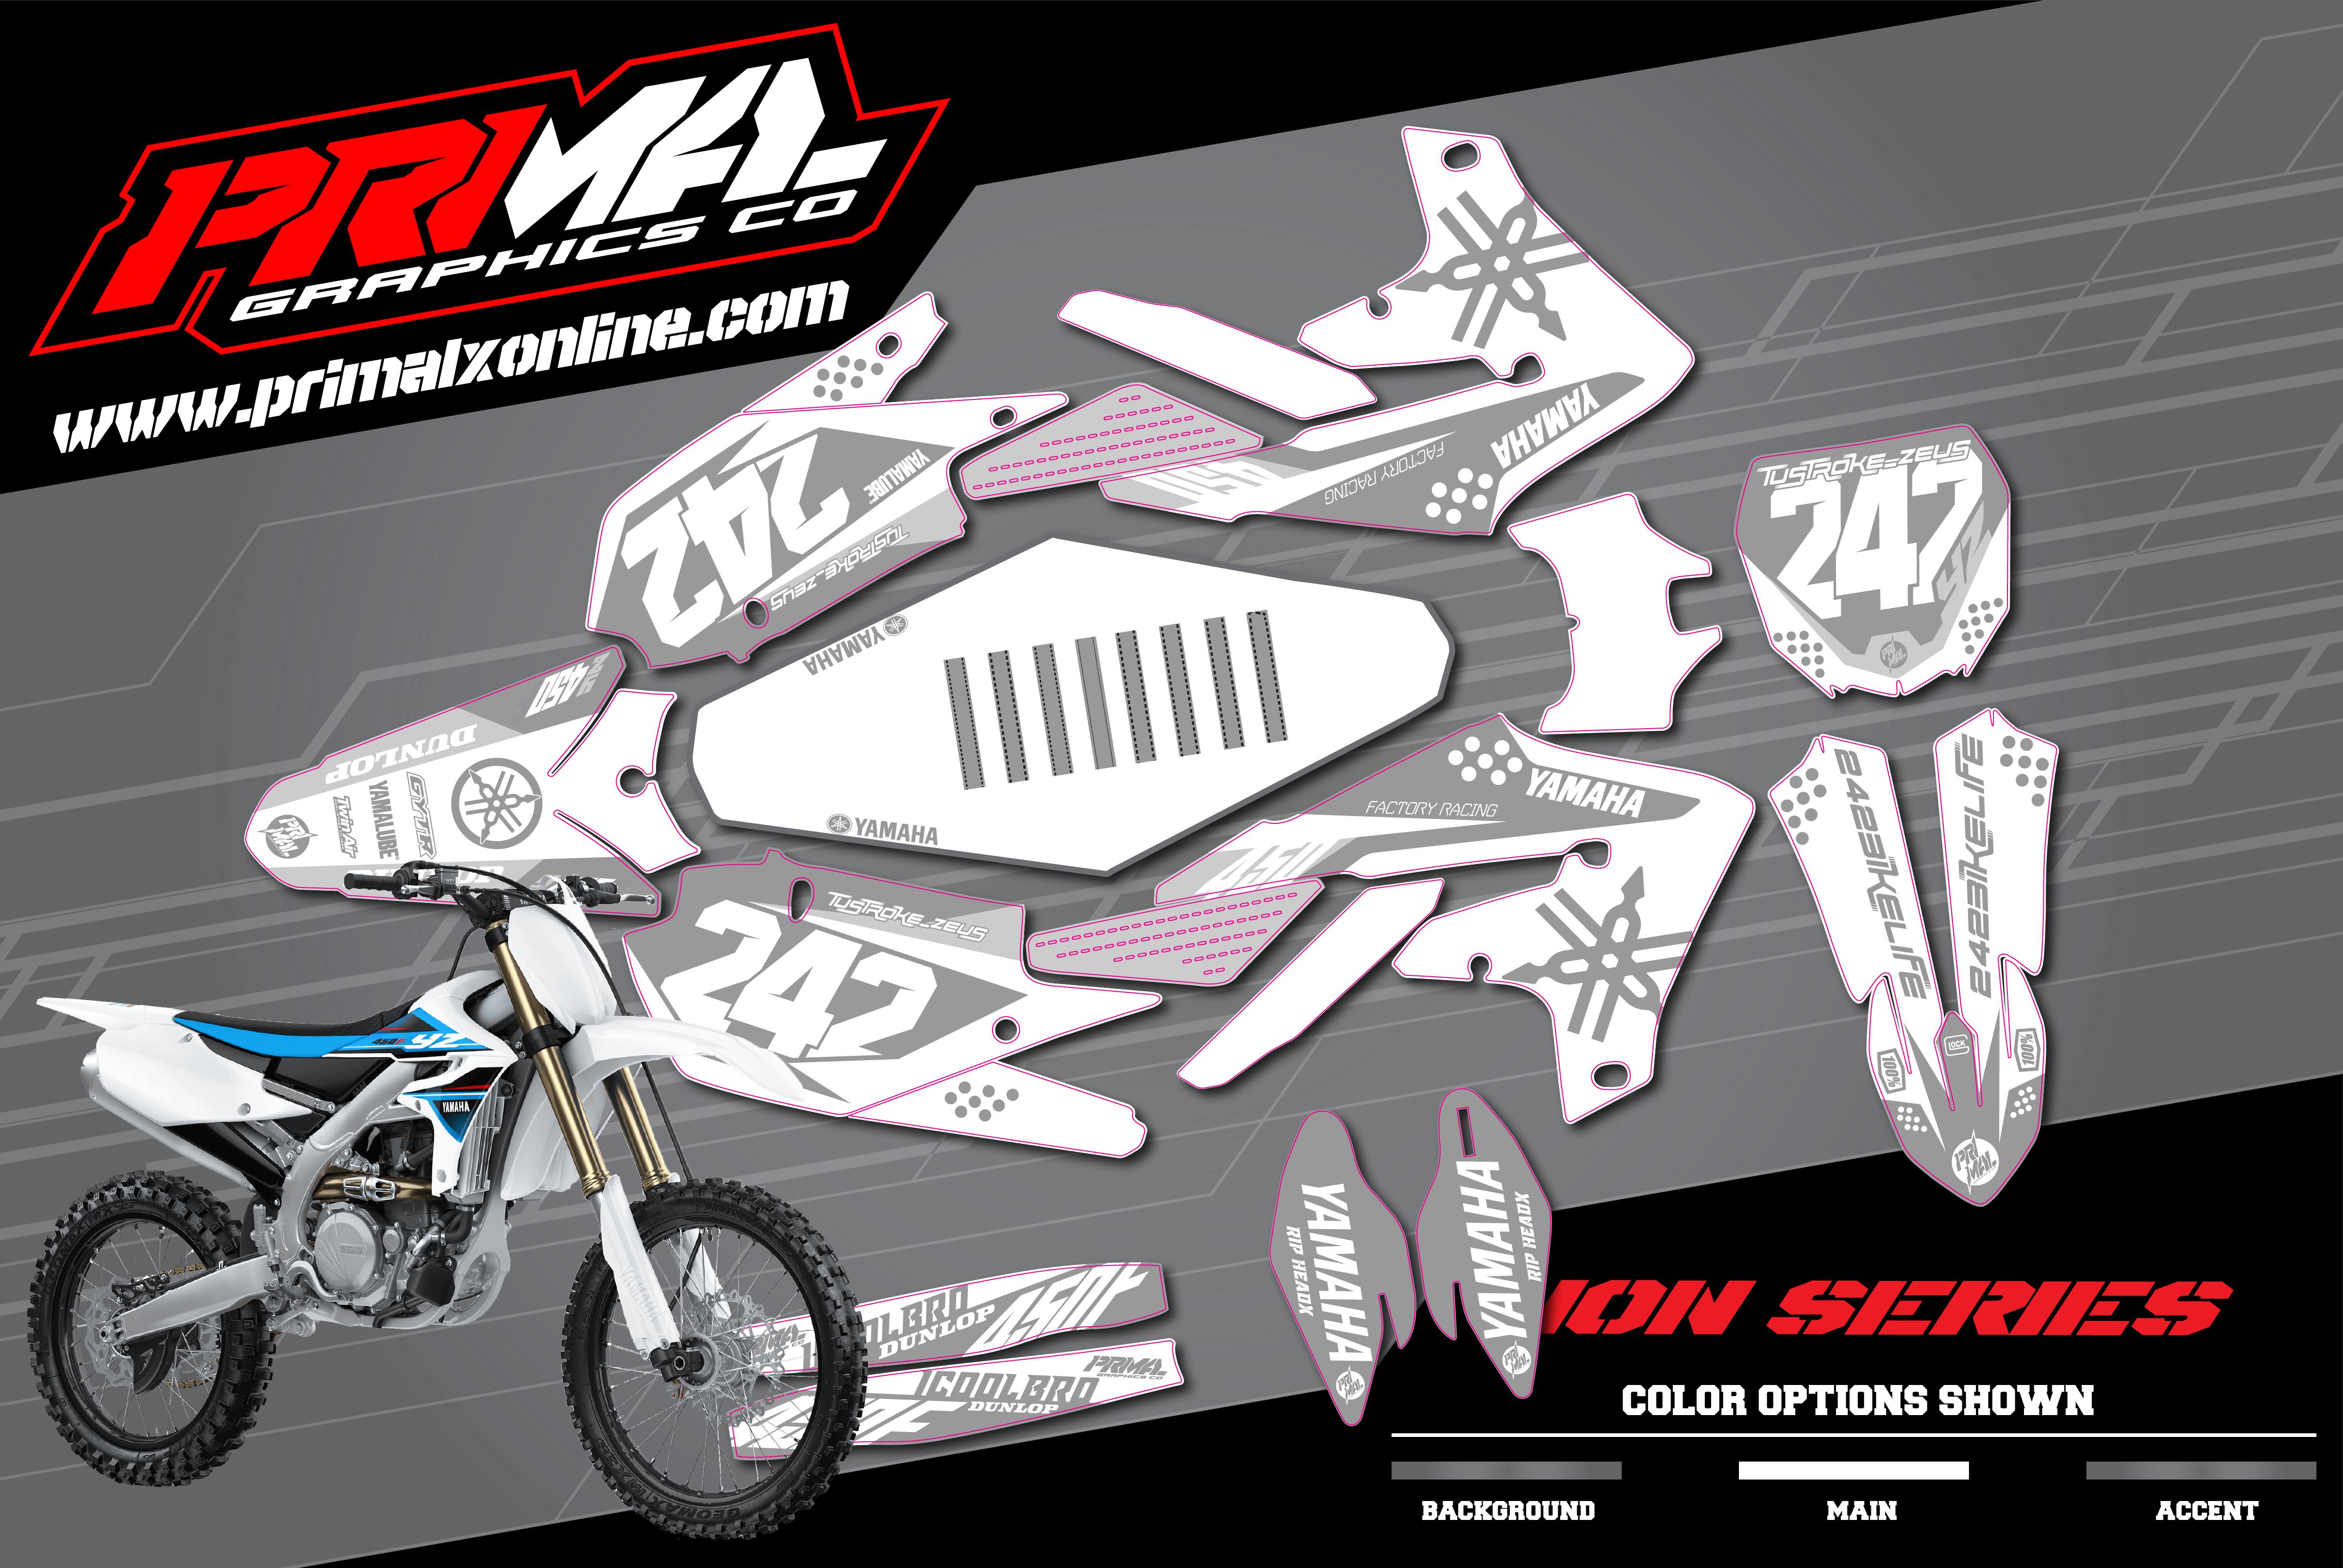 PRIMAL-X-MOTORSPORTS-PRIMAL-GRAPHICS-CO-YAMAHA-YFZ-CLEAN-MOTOCROSS-GRAPHICS-BIKELIFE-FACTORY-YAMAHA-01